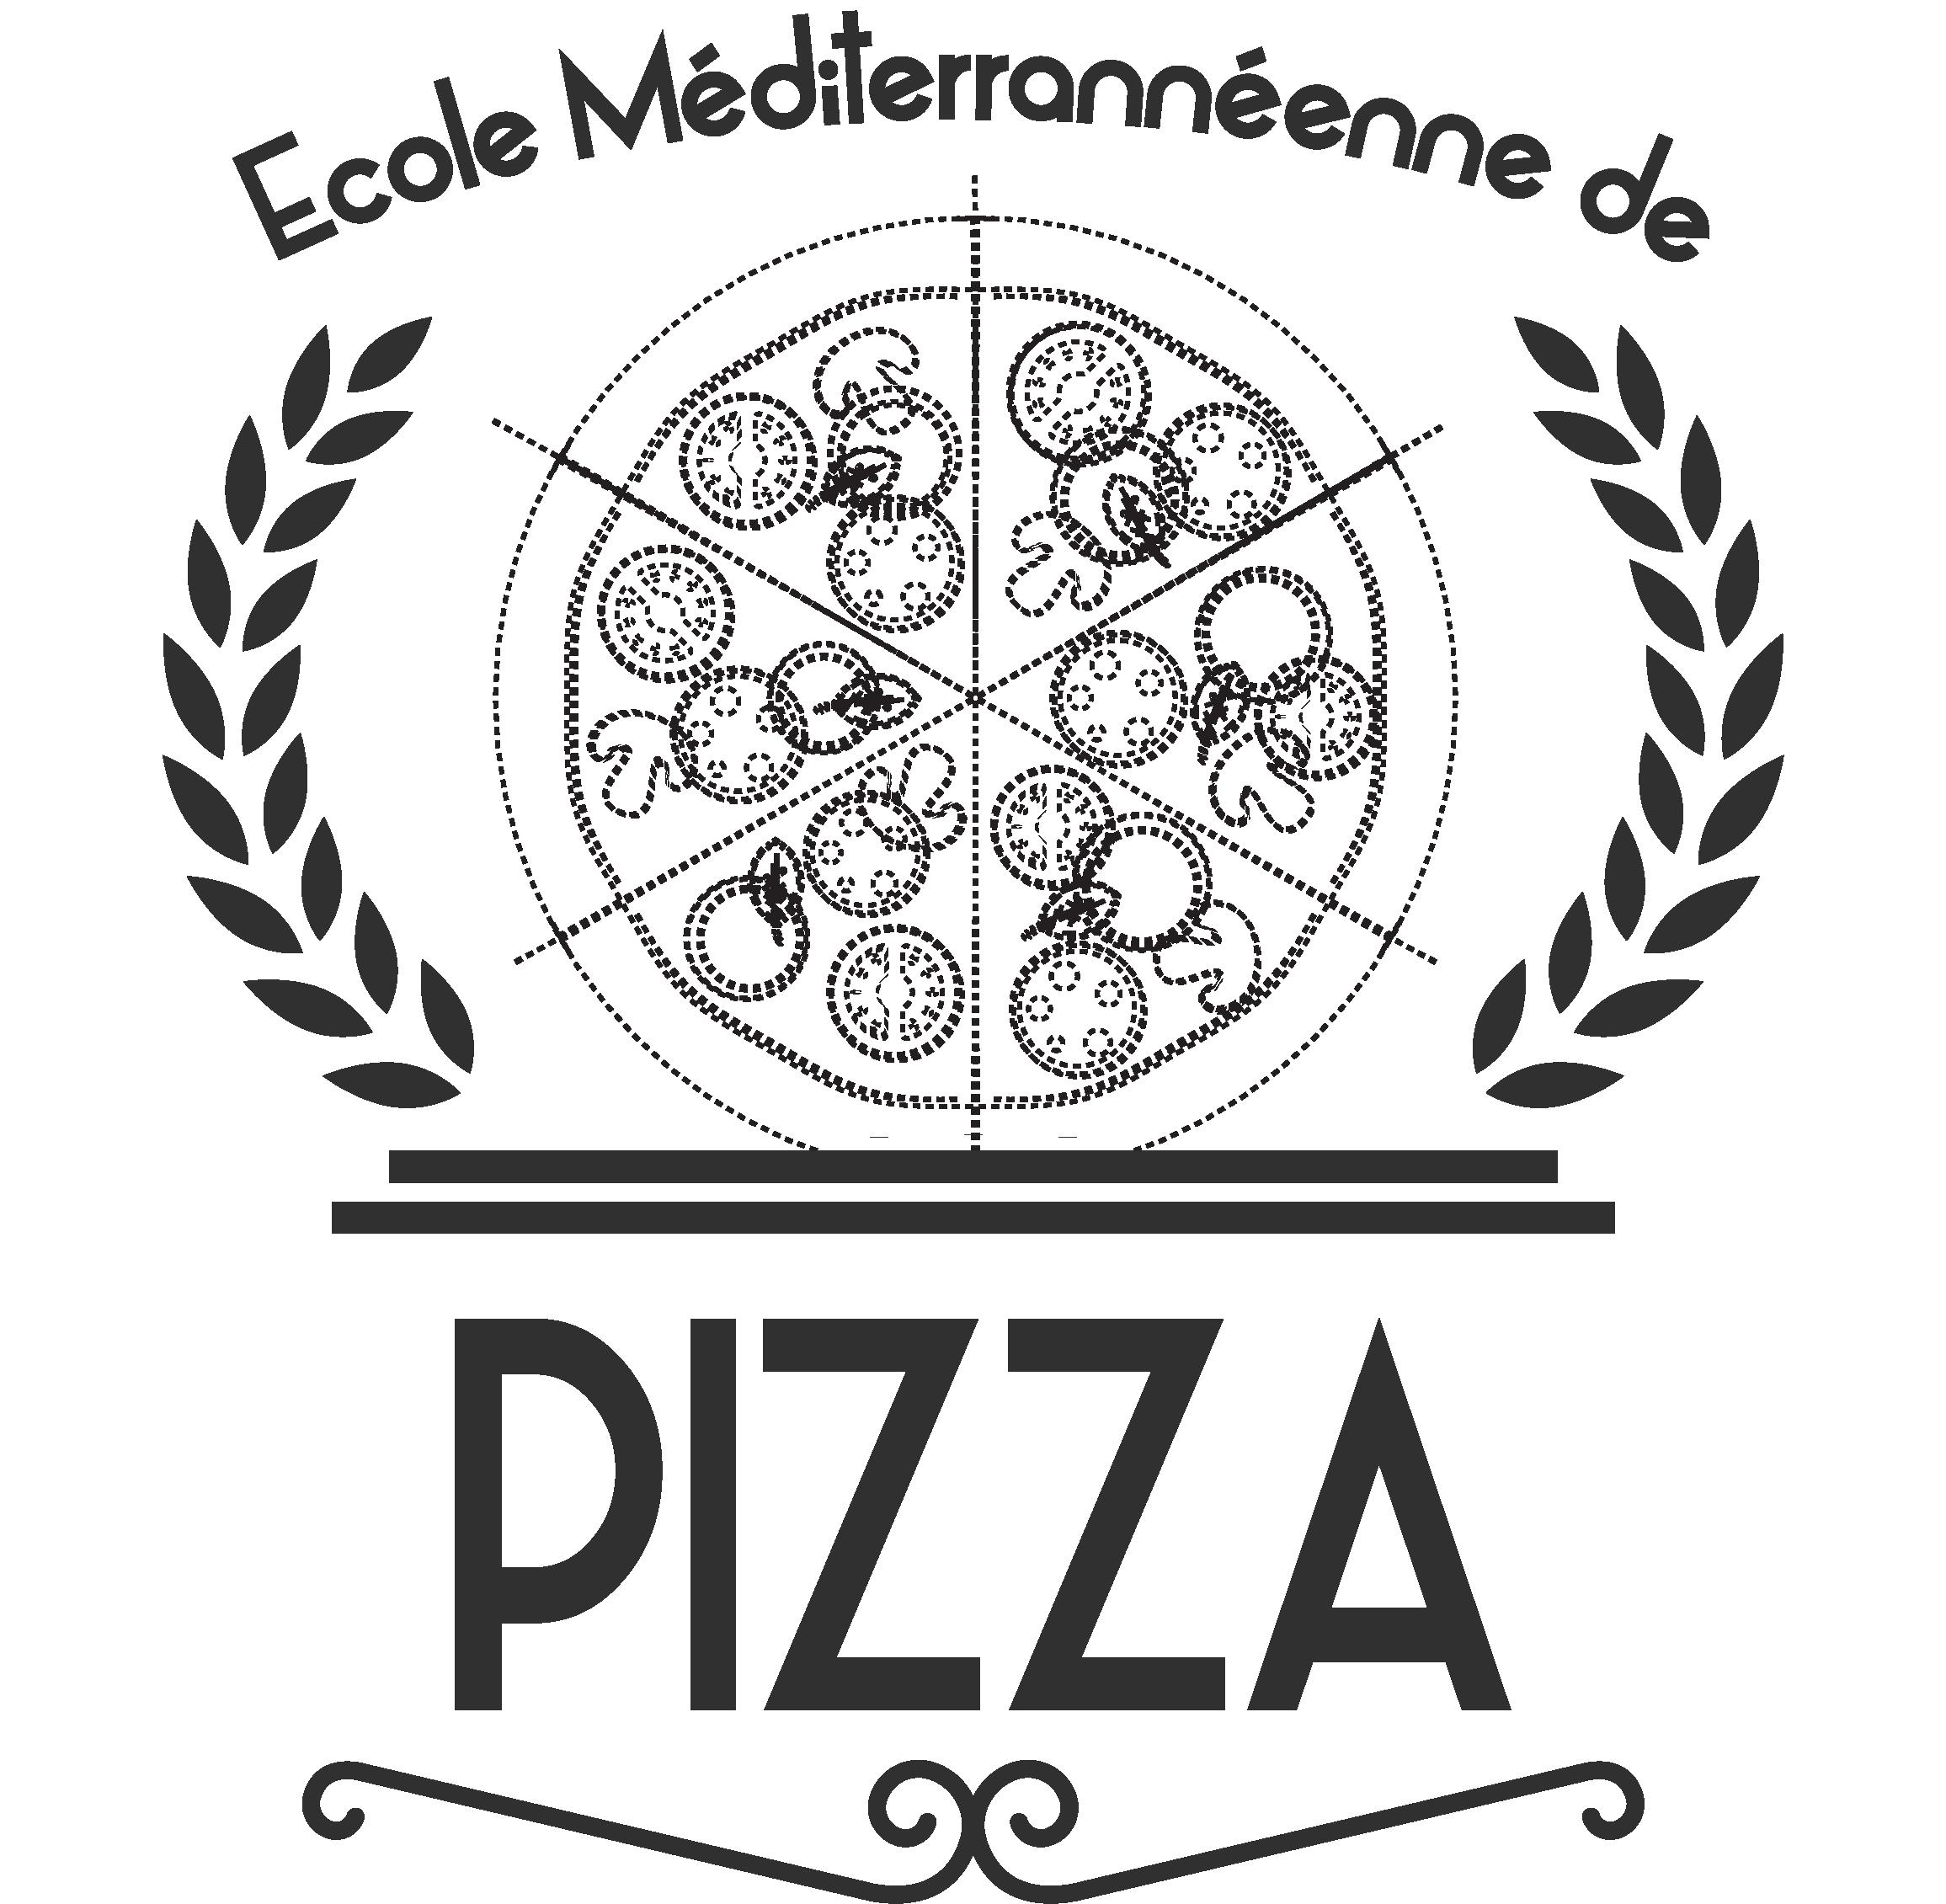 Ecole Méditerranéenne de Pizza - Scola Pizza